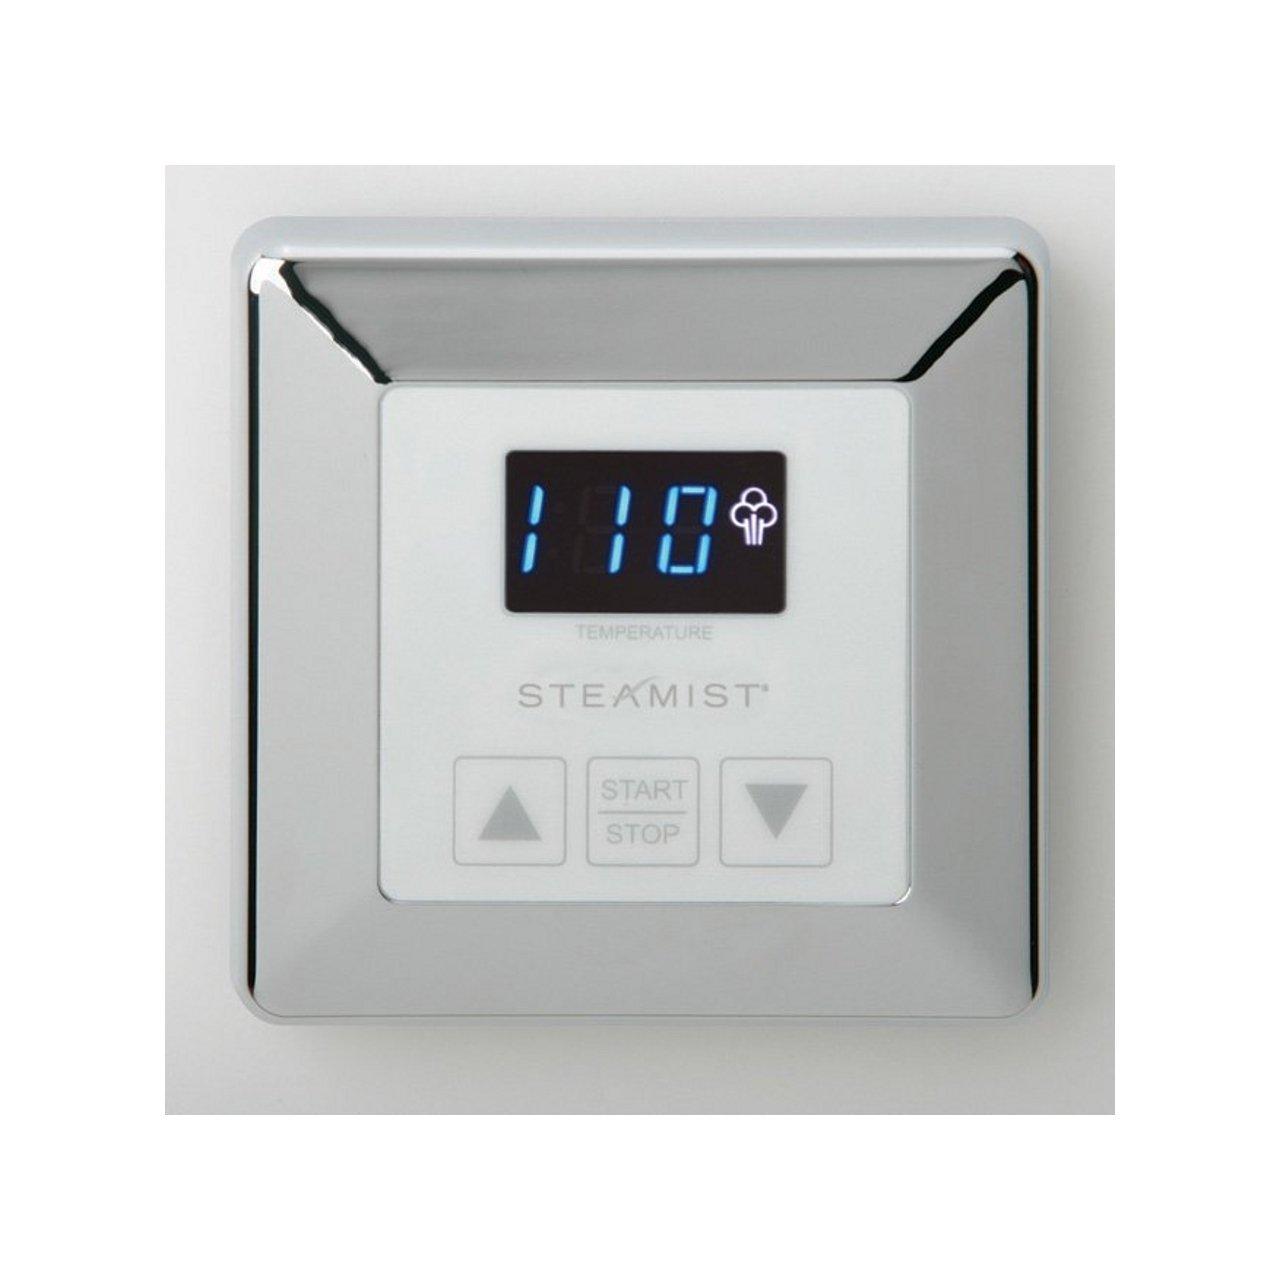 Steamist SMC-150-PC Time/Temperature Control, Polished Chrome